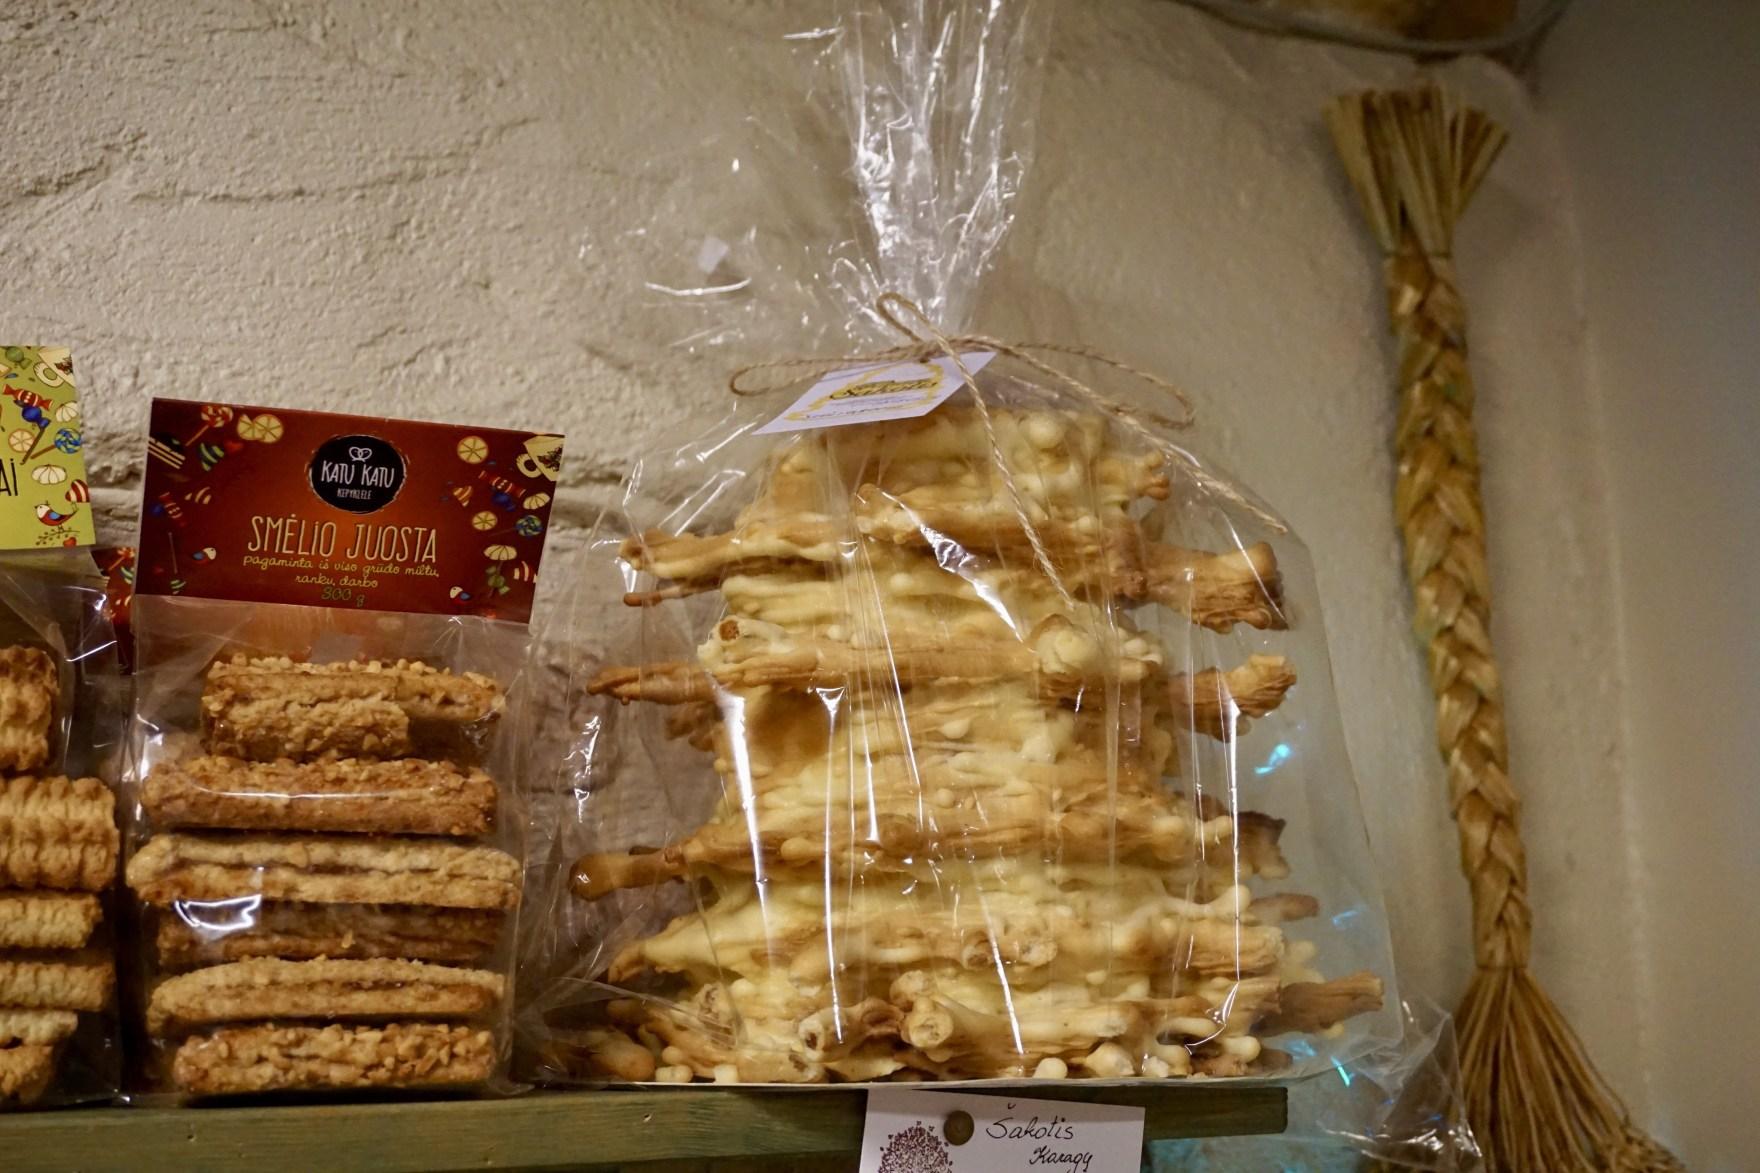 Food souvenirs from Lithuania - Sakotis